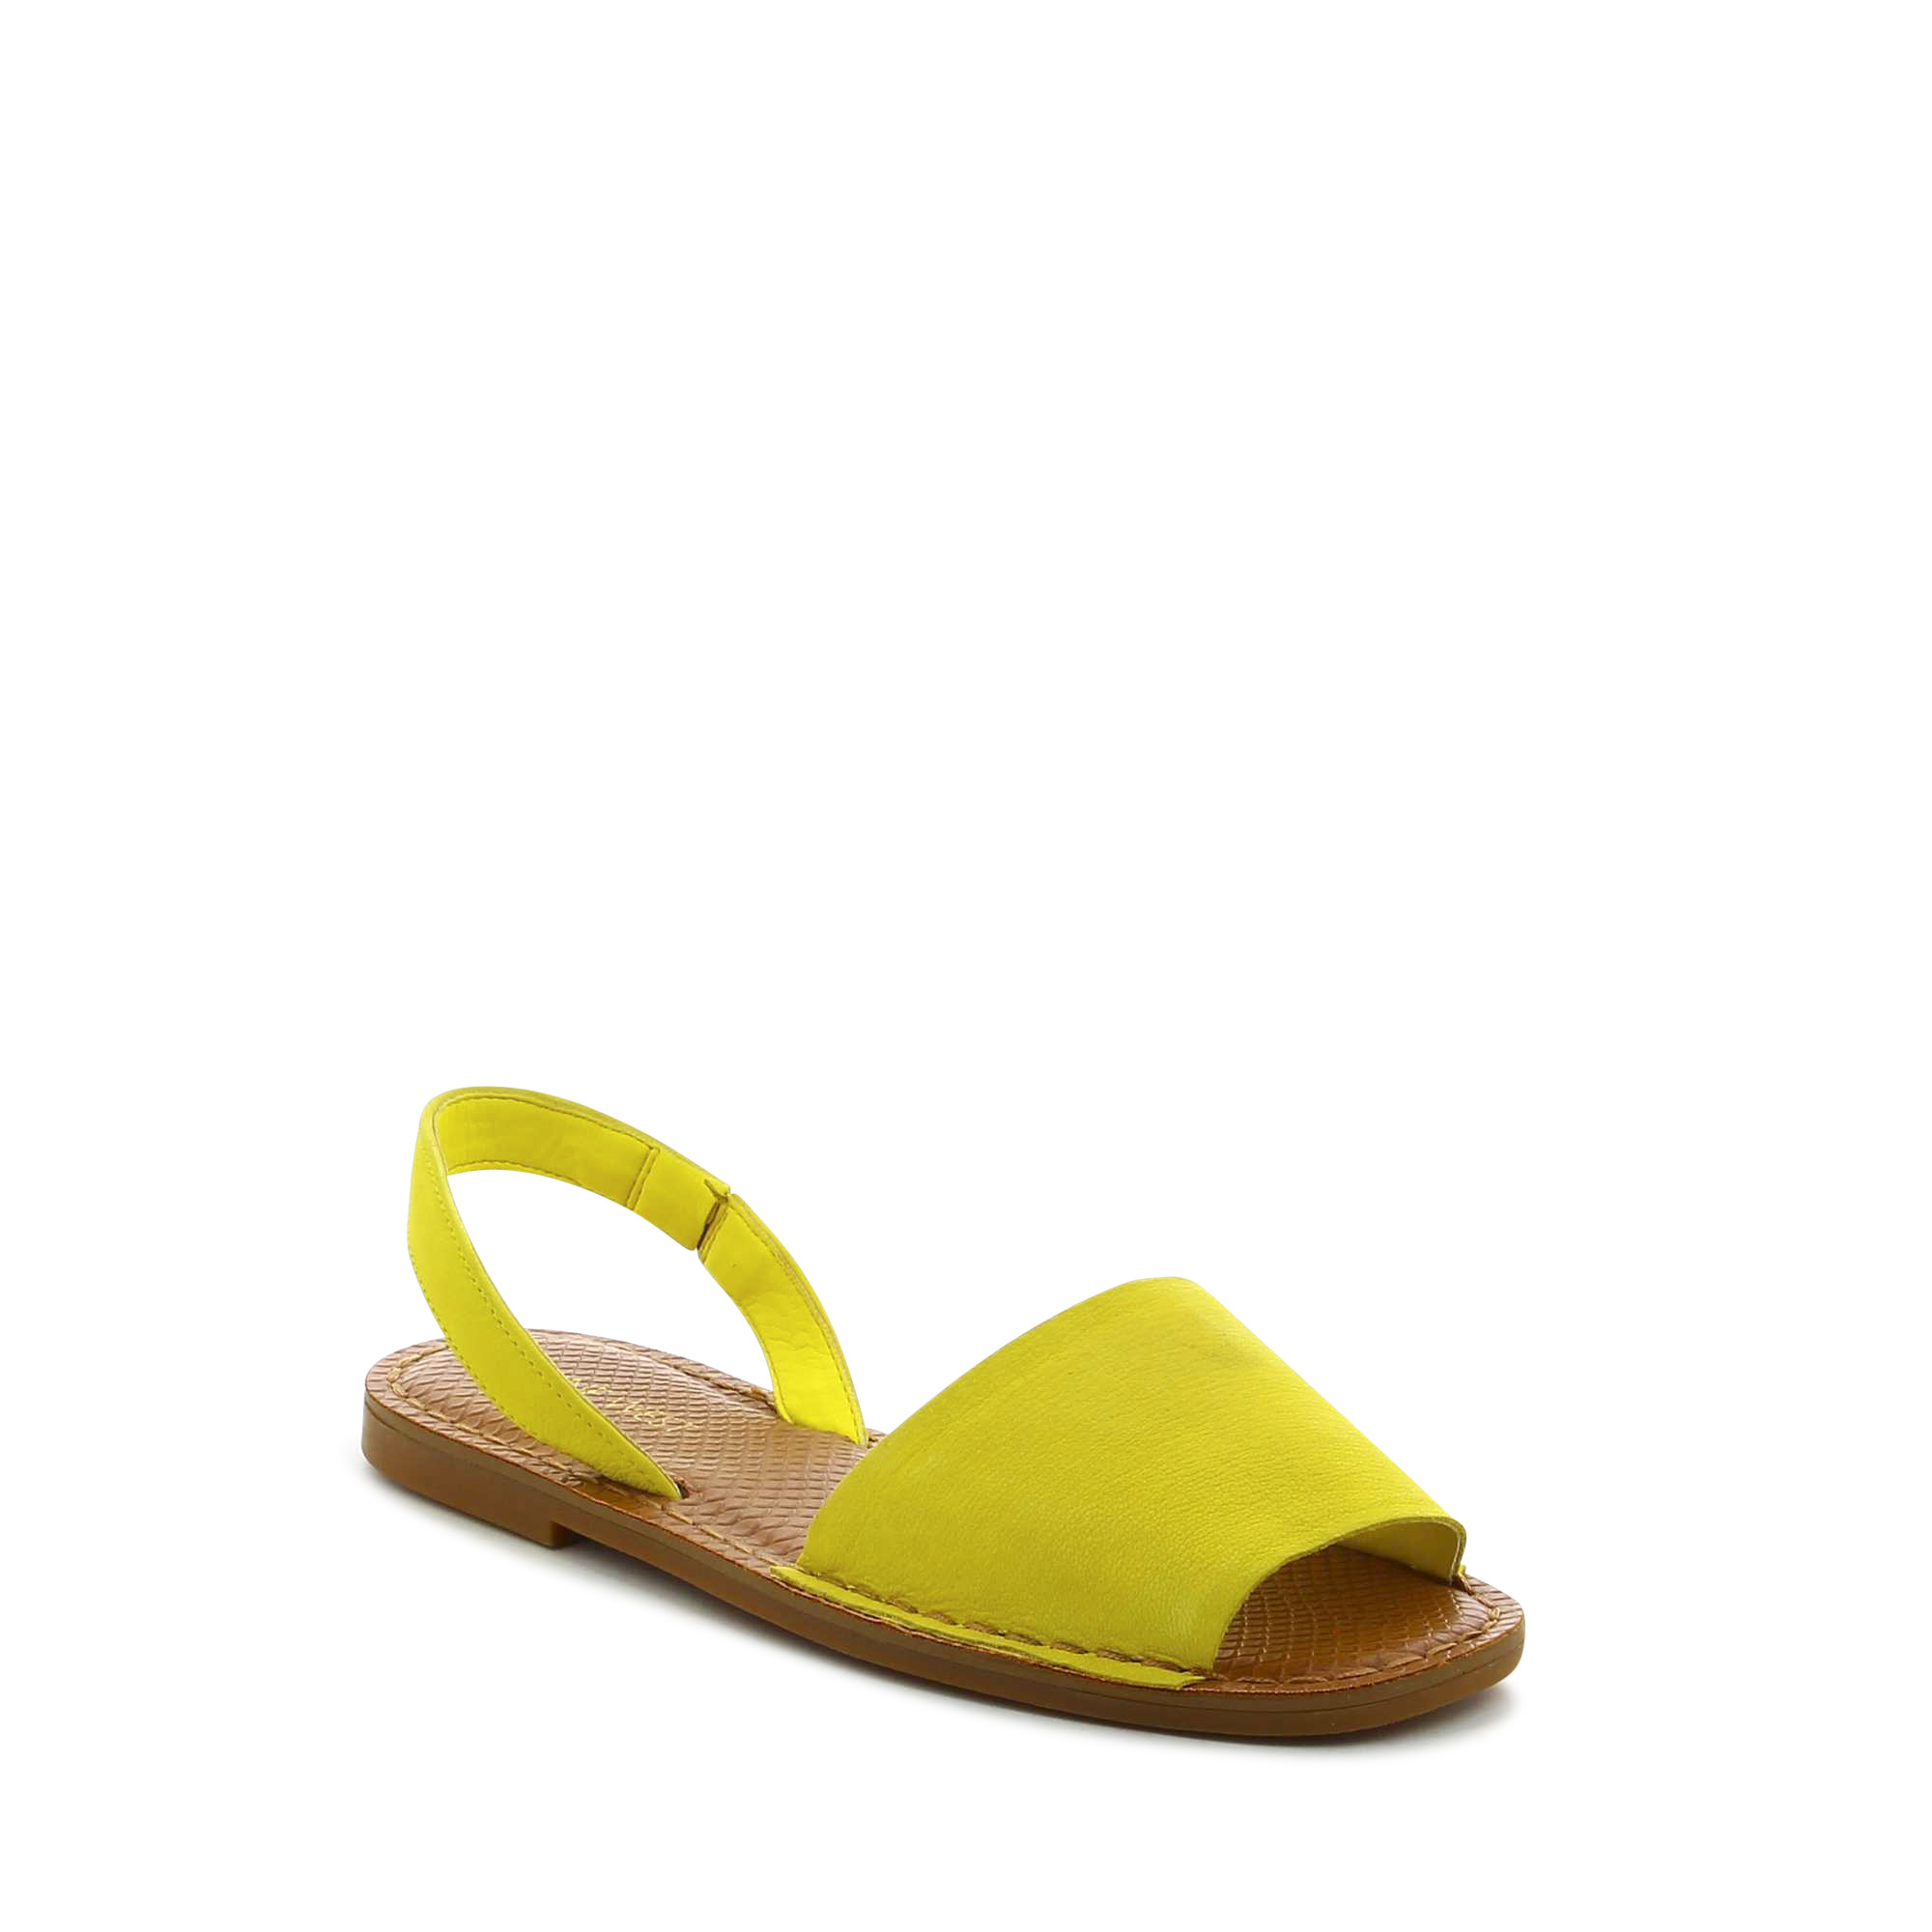 Izzio סנדל ספרדי צהוב